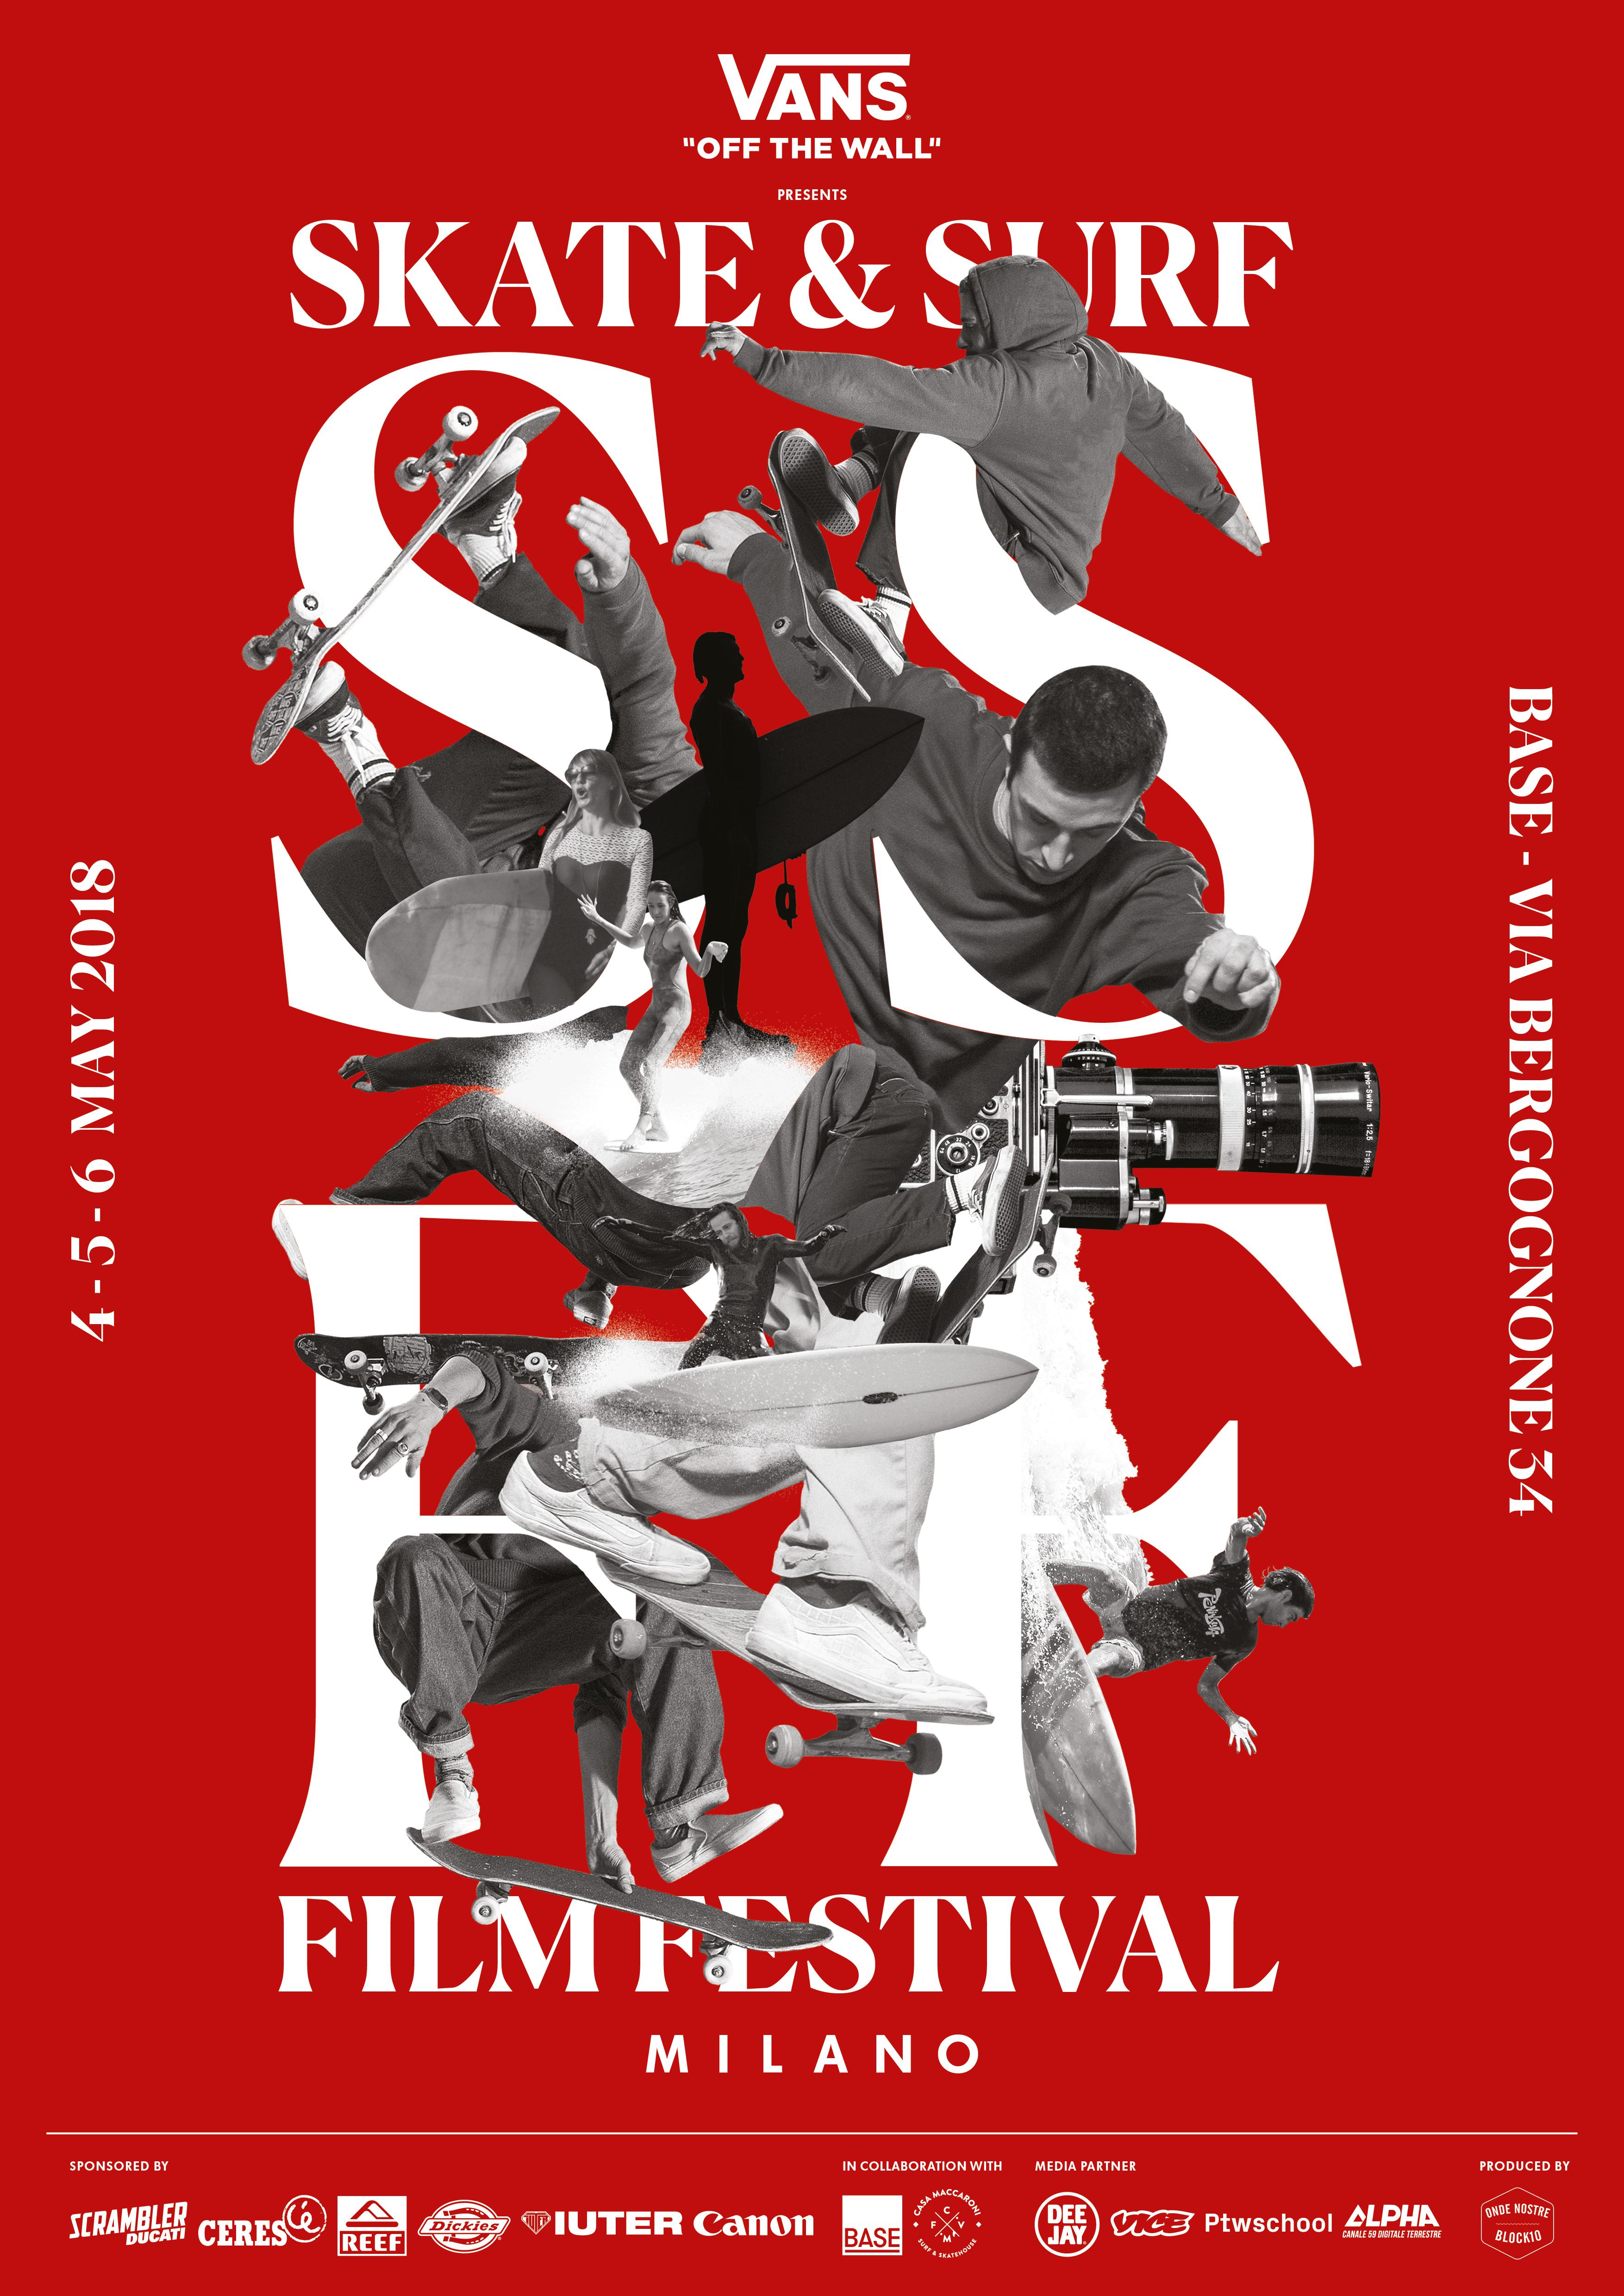 SSFF 2018 - Skate e Surf Film Festival Milano